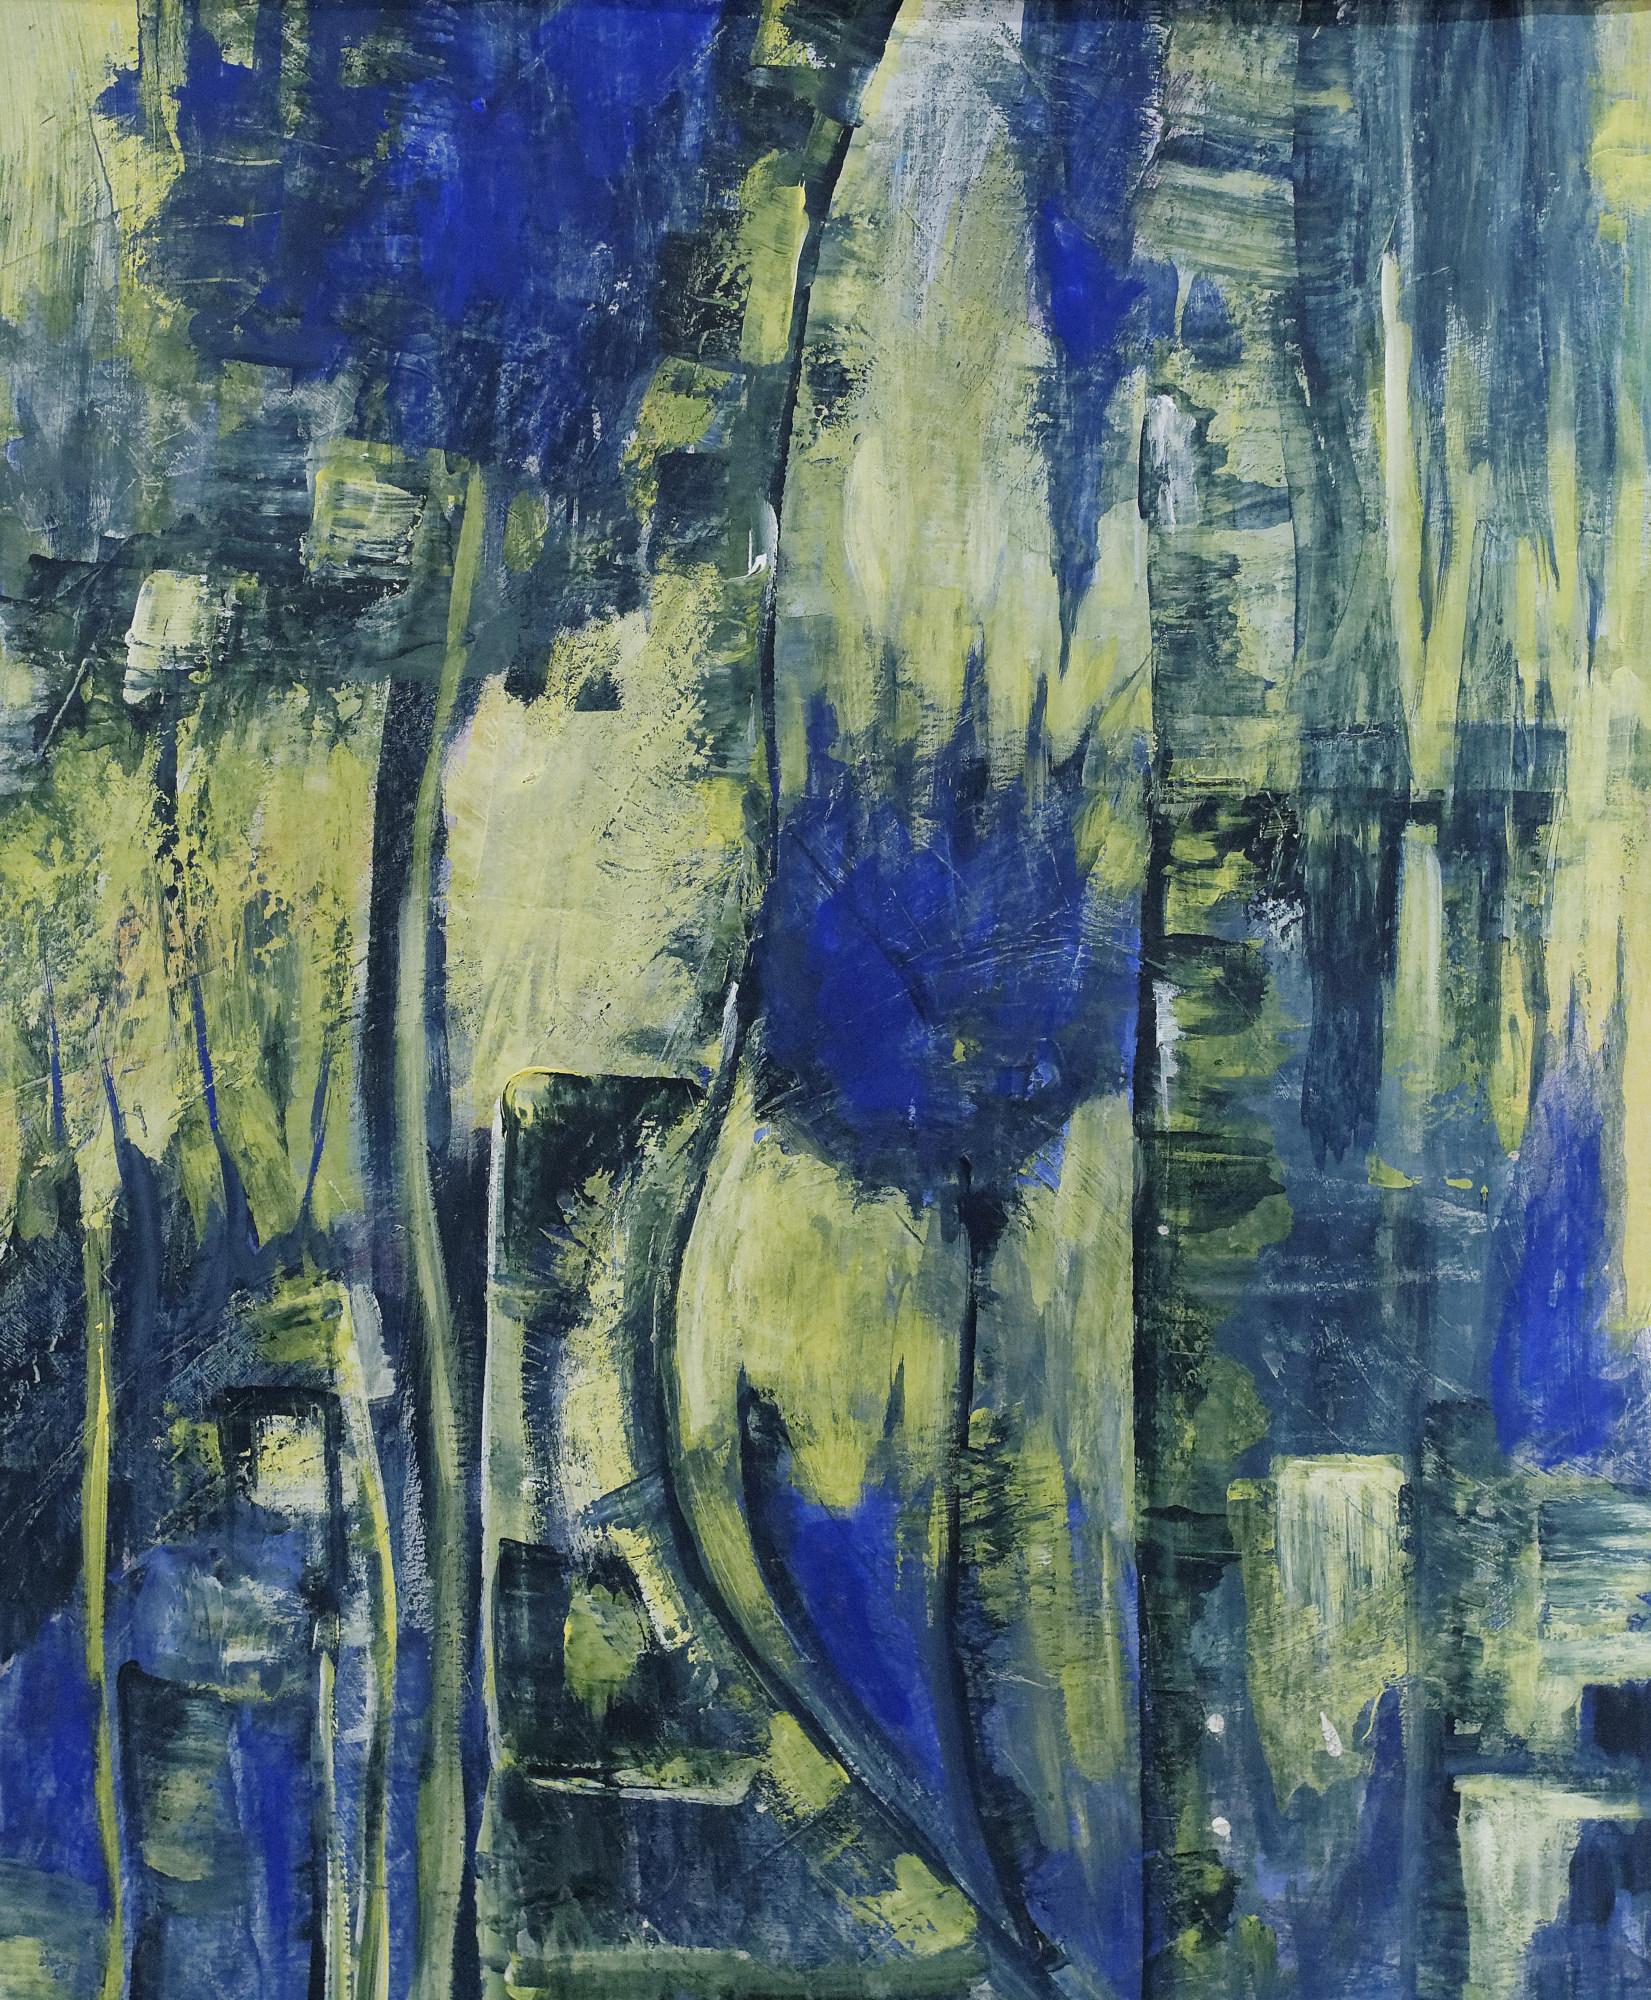 2003 - Blumen abstrakt, 50x60cm, Acryl